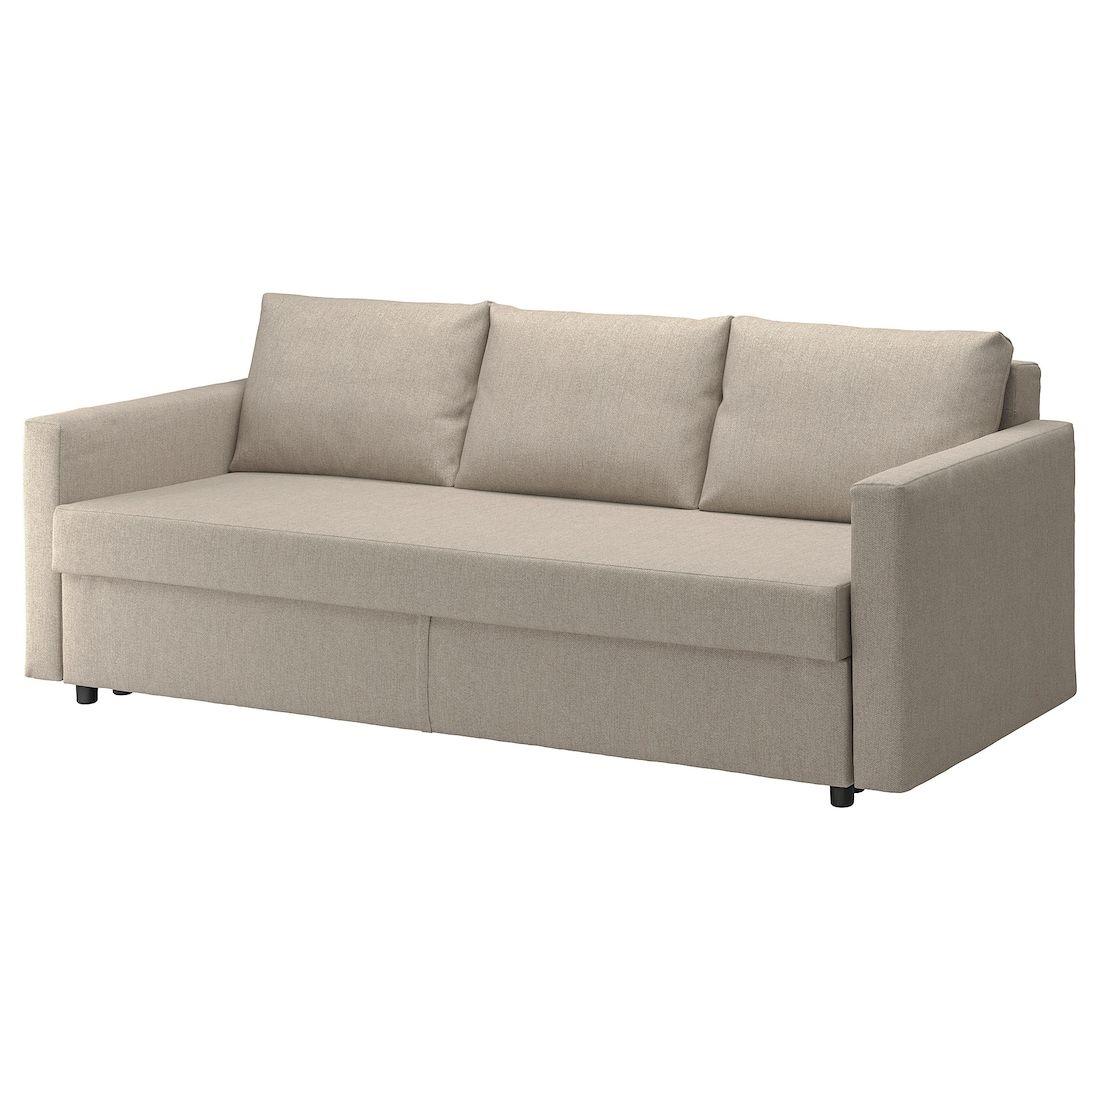 Friheten Sleeper Sofa Hyllie Beige Ikea In 2020 Ikea Bed Sleeper Sofa Sofa Bed With Storage